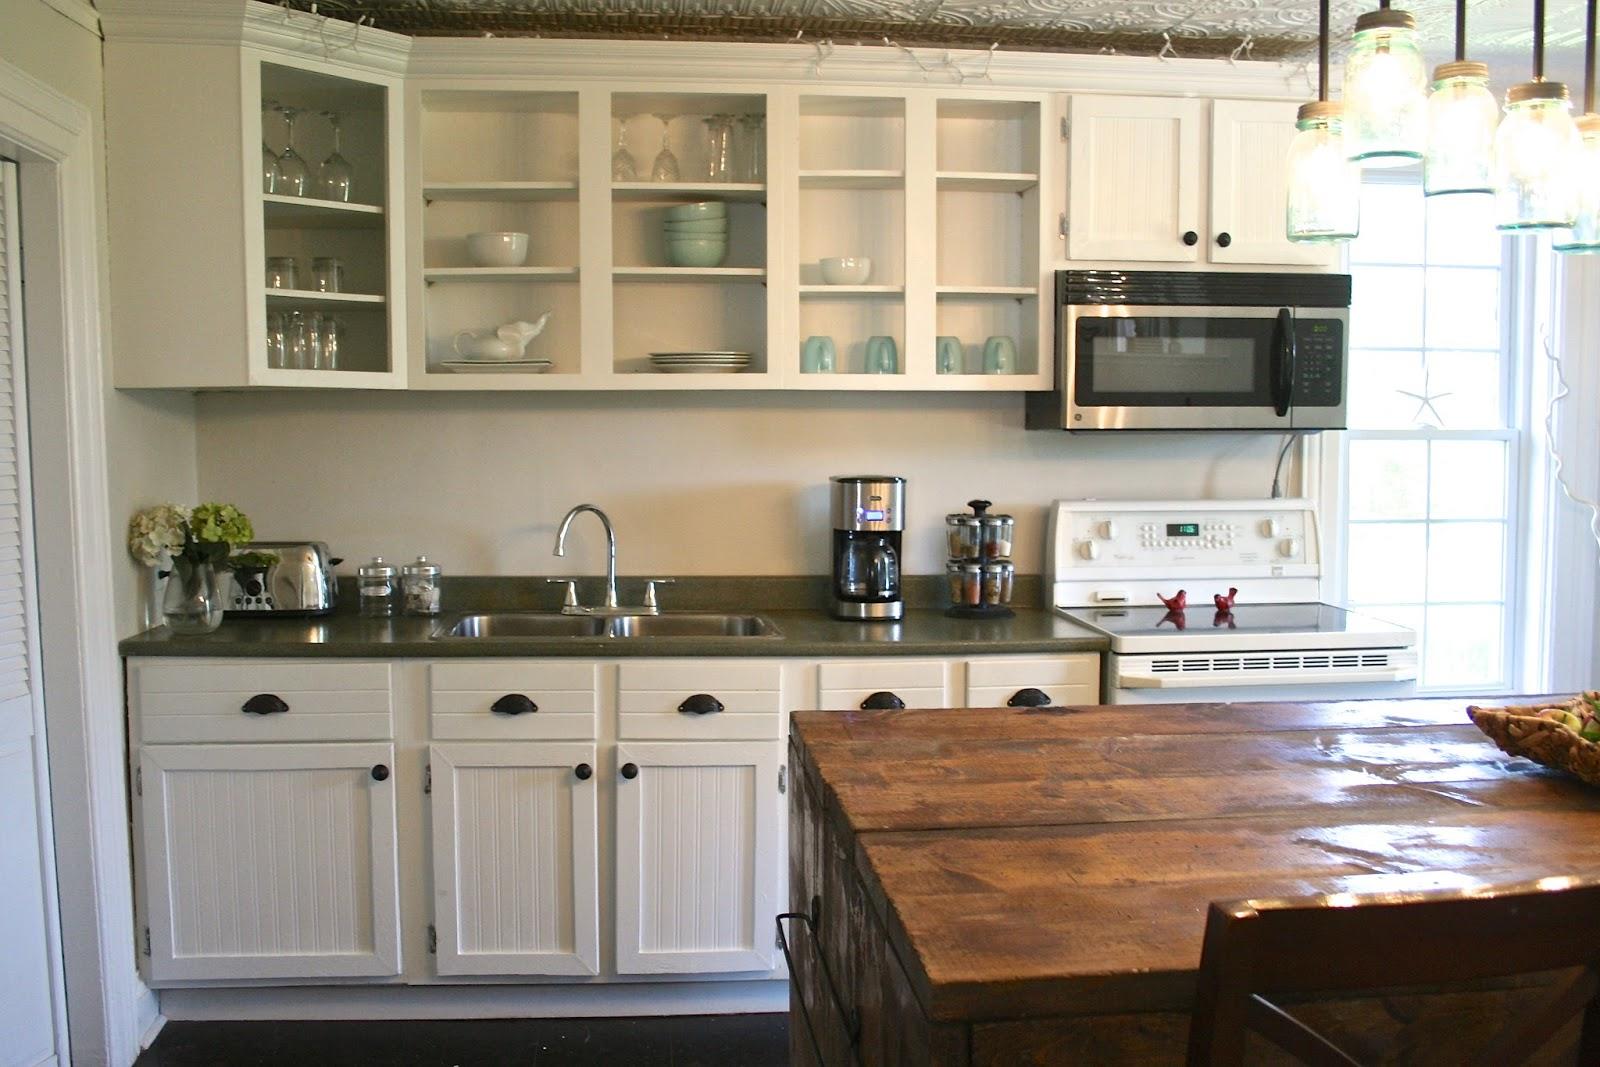 kitchen cabinets ideas diy photo - 6